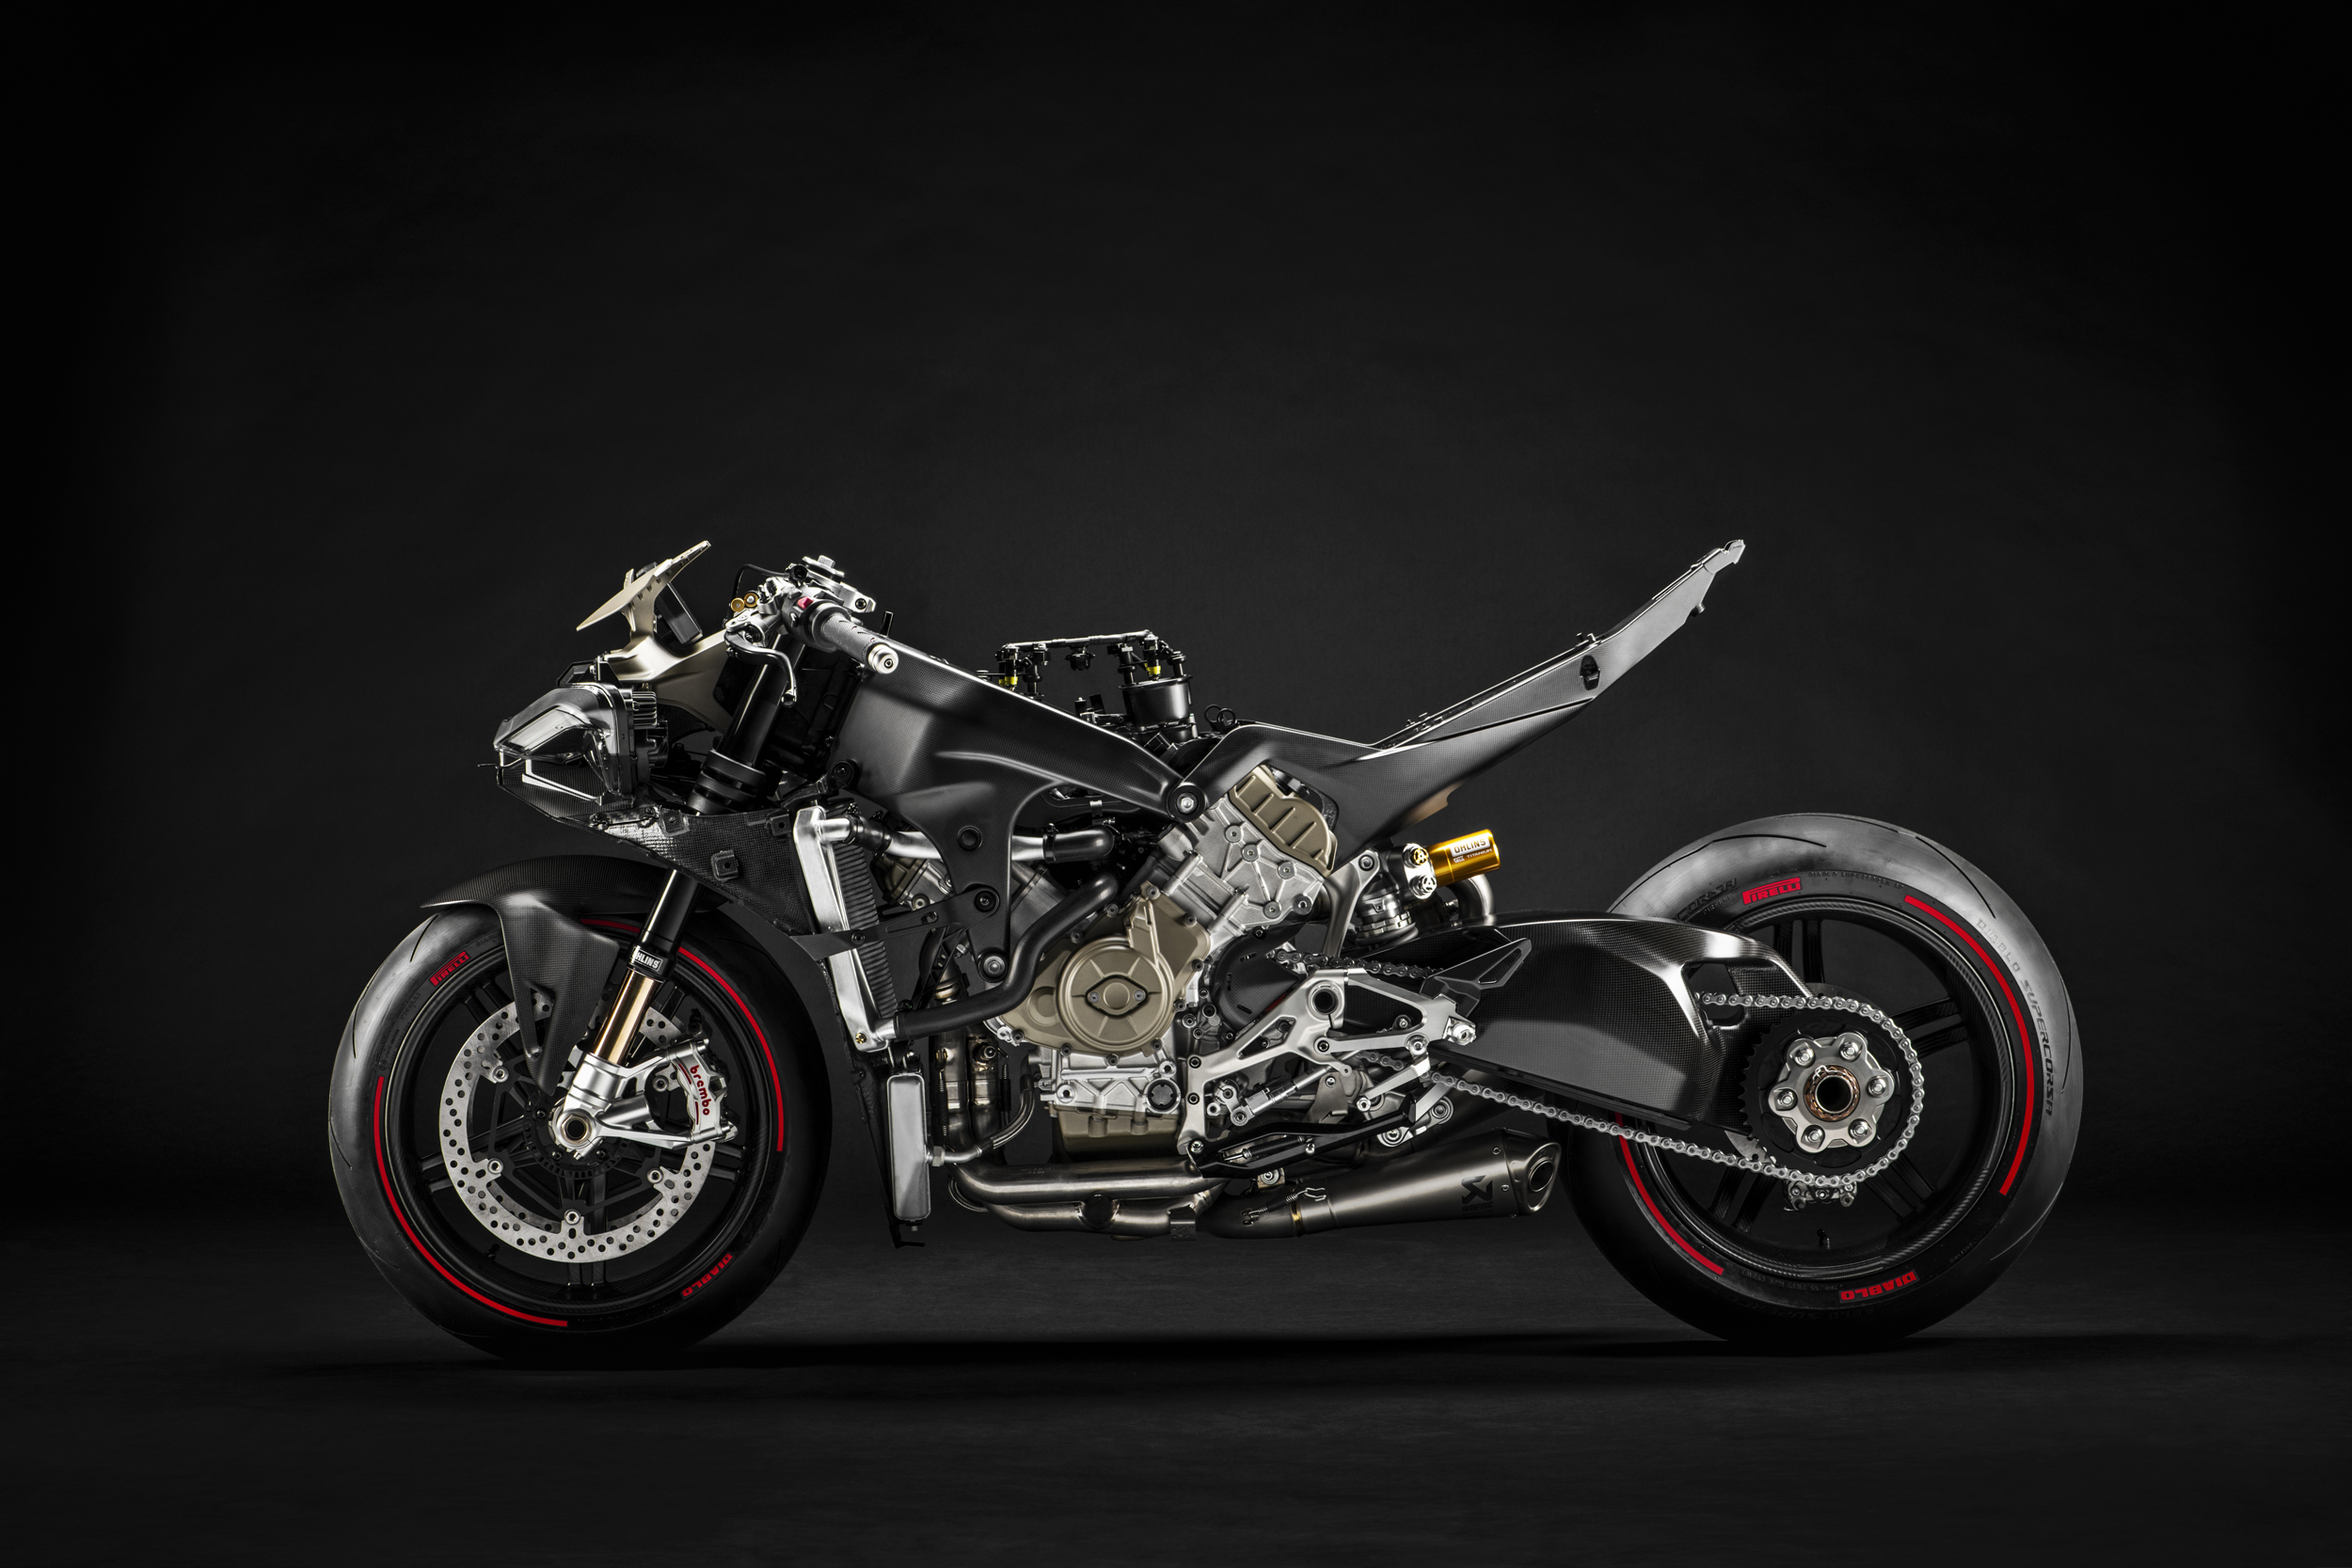 2020 Ducati Superleggera V4 [4]